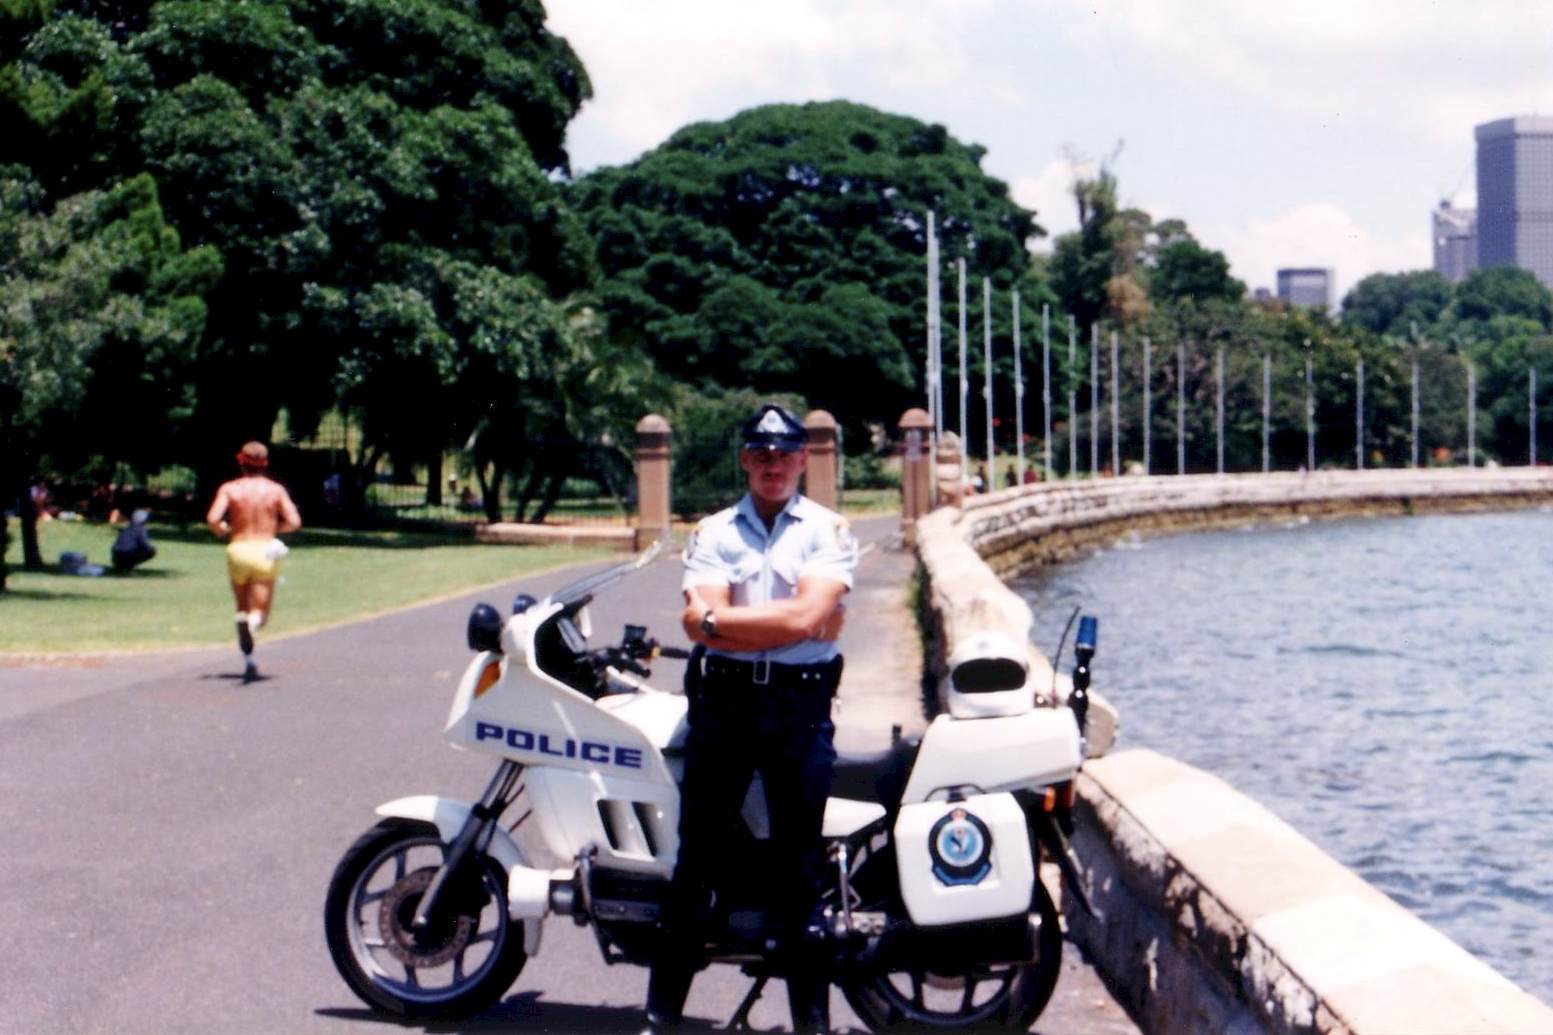 Gregory Peter REHN | Australian Police